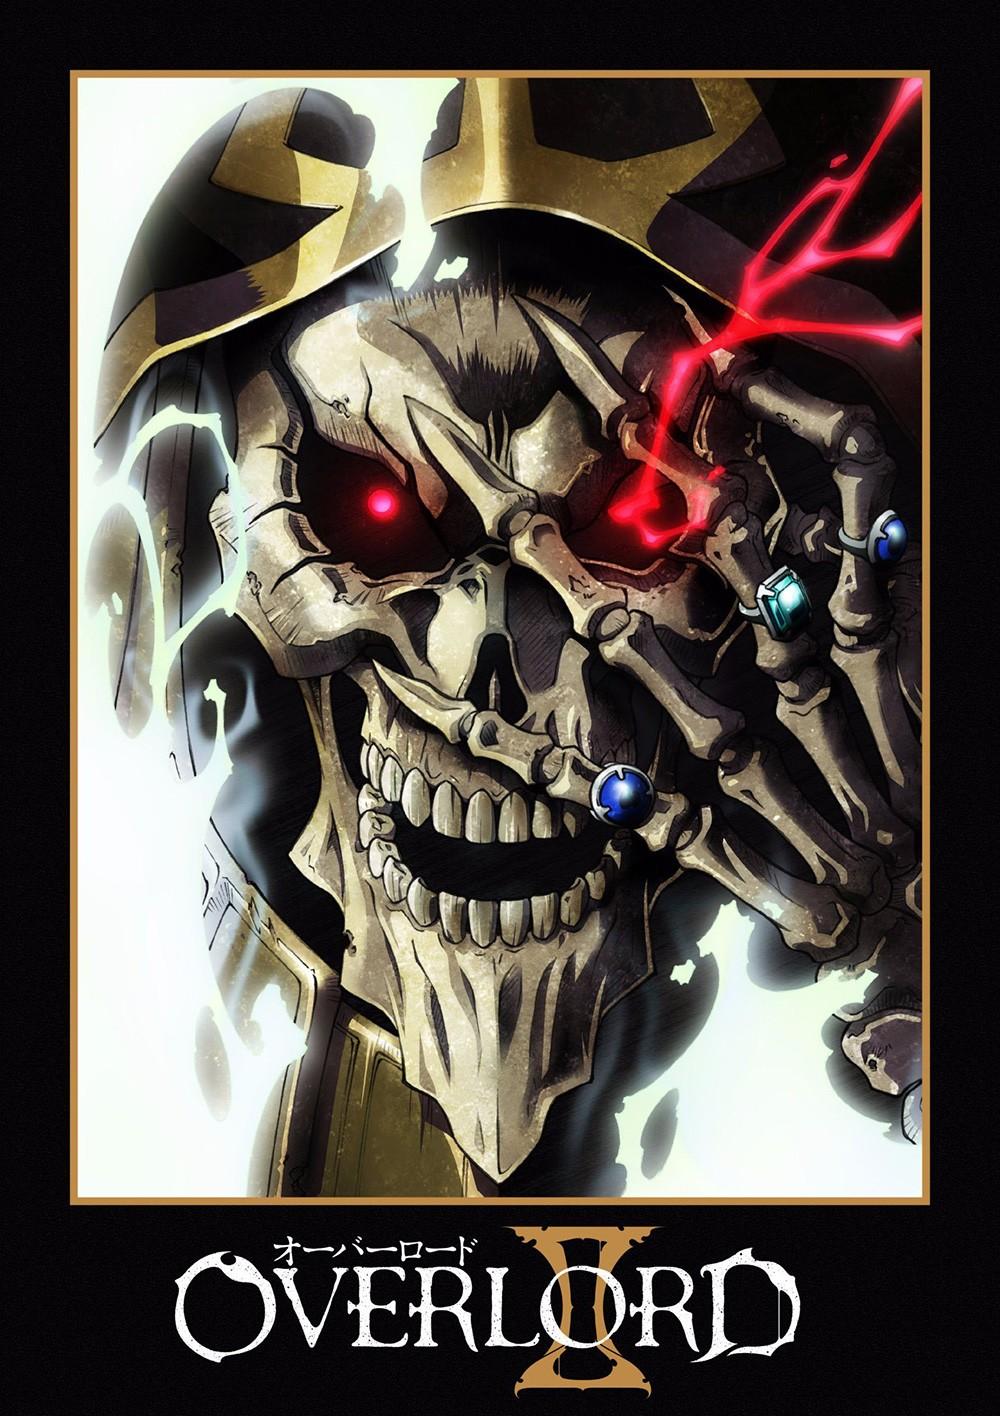 3MrmeADQvm7YY - [Aporte] Overlord II [13/13][85MB][MLF][MEGA][Concluido...] - Anime Ligero [Descargas]